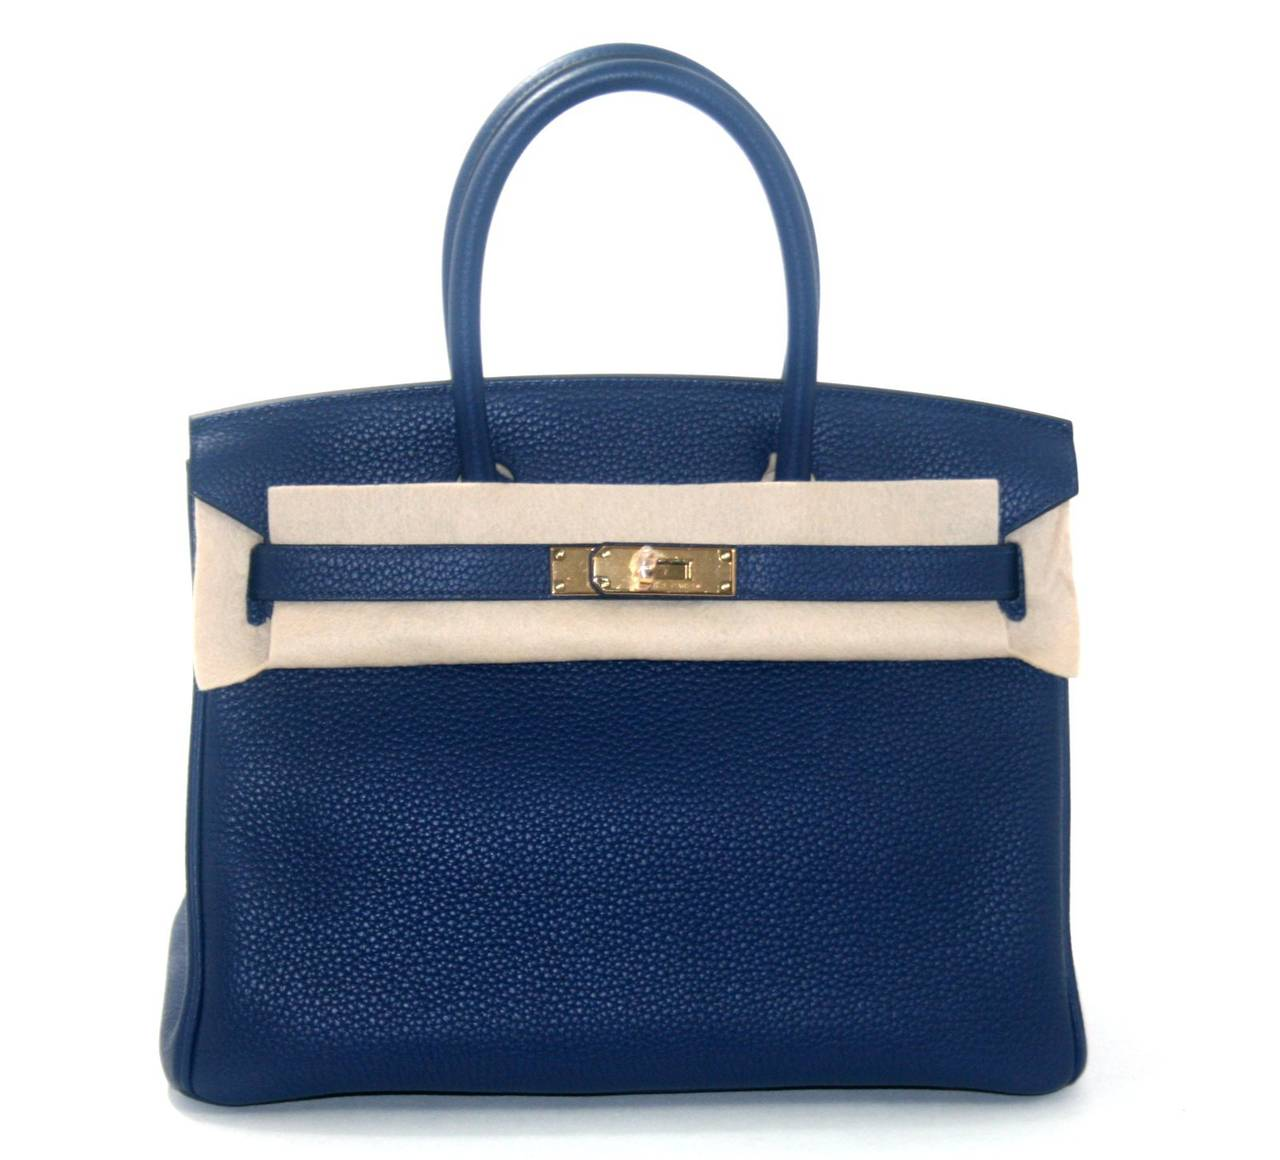 hermes birkin bag 35cm blue sapphire clemence gold hardware